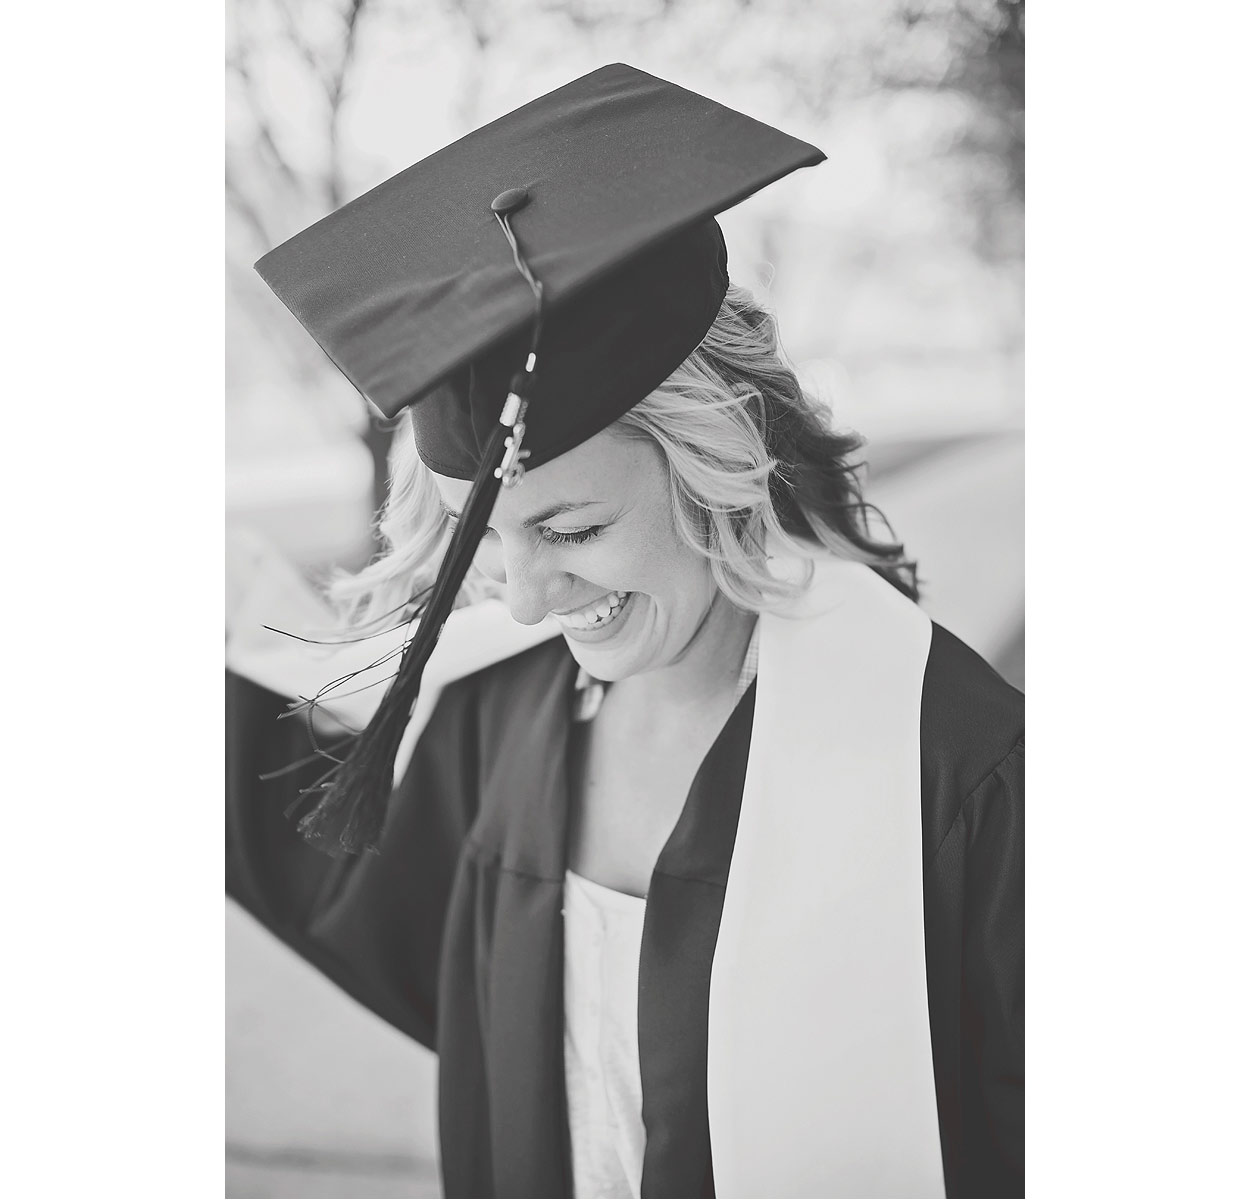 CollegeGraduationPortraits-HeidiRandallStudios-Courtney-8.jpg